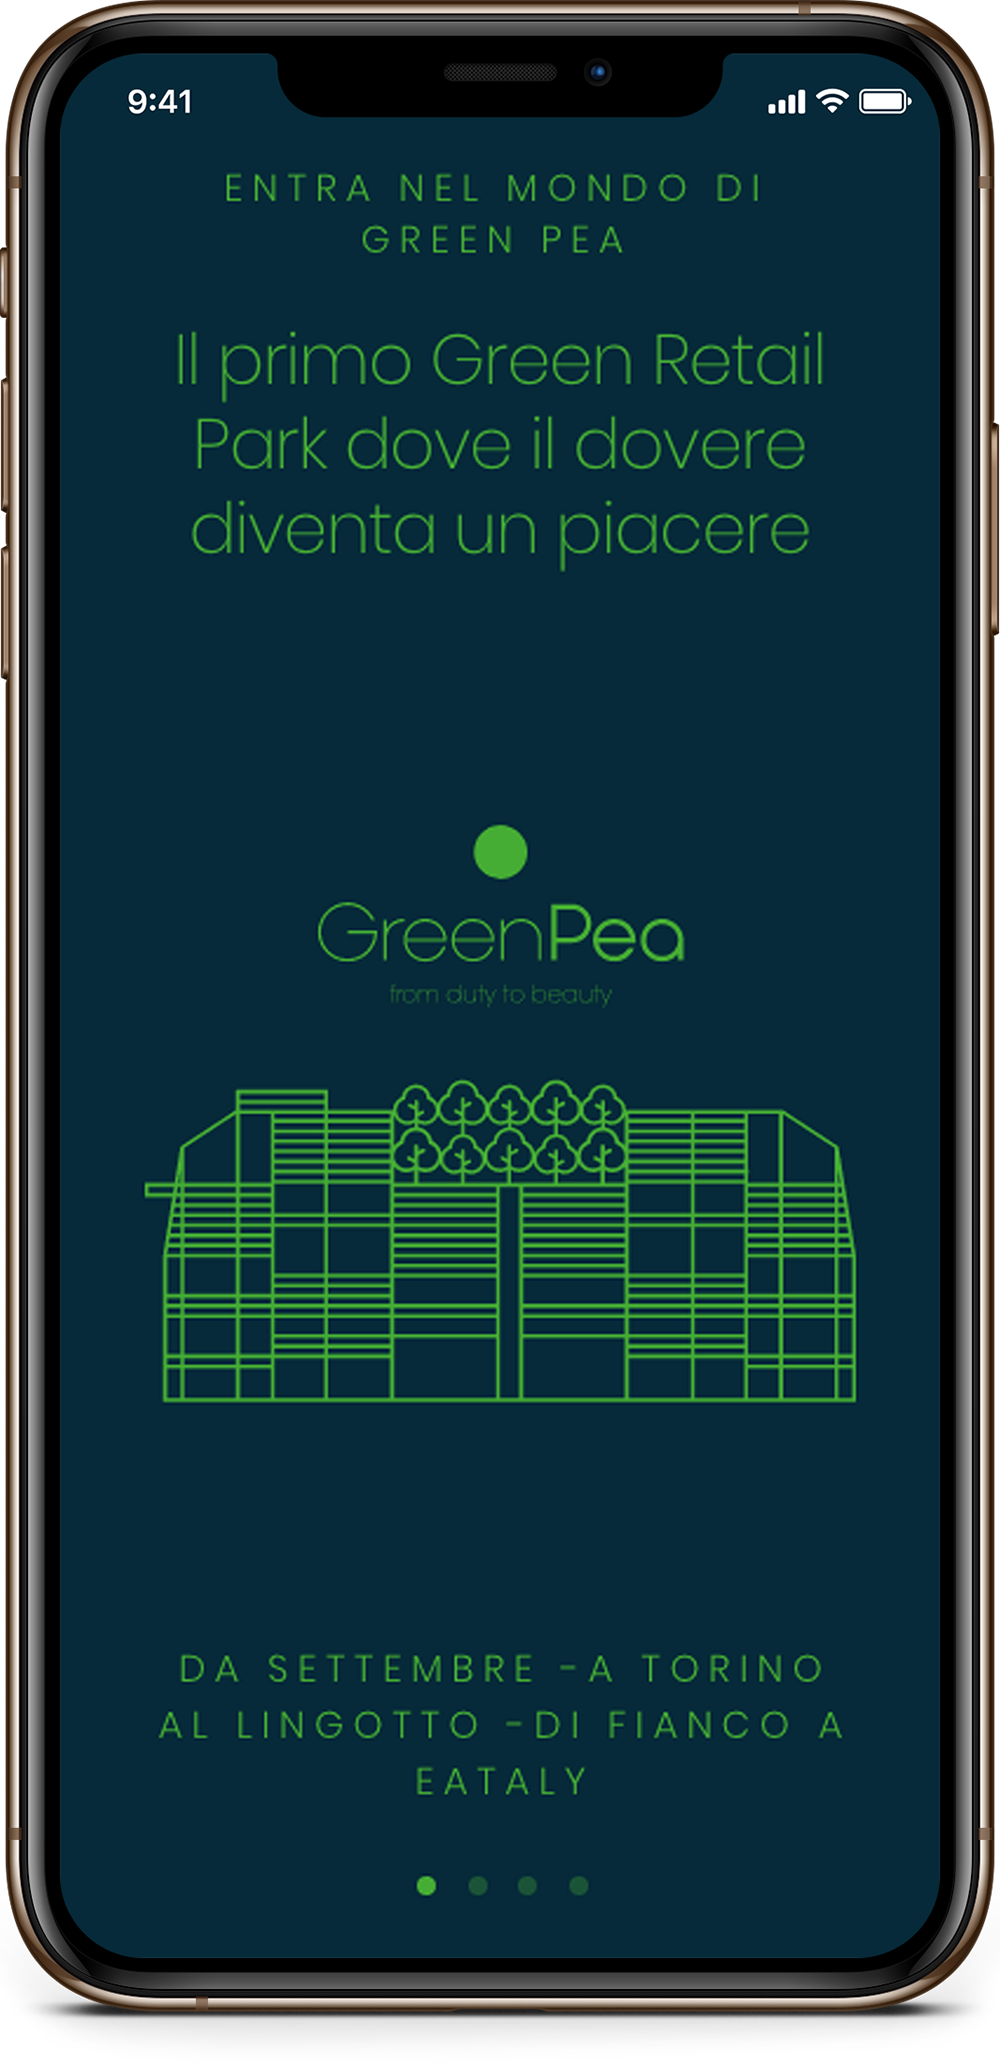 Dettagli app Green Pea